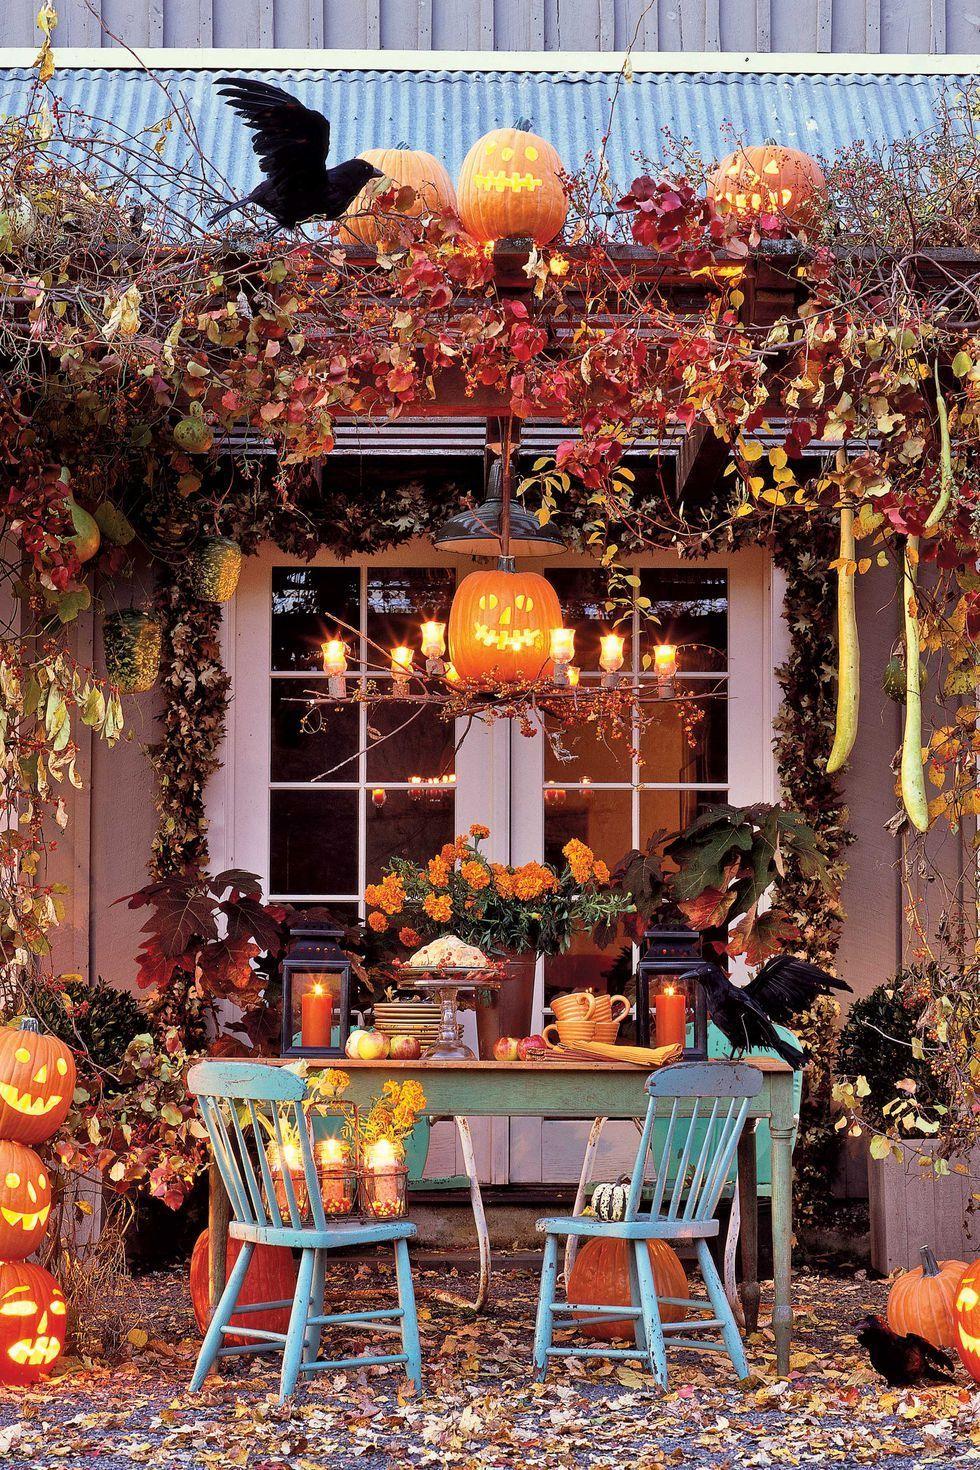 30+ Best Outdoor Halloween Decoration Ideas - Easy Halloween Yard - halloween decoration ideas for yard